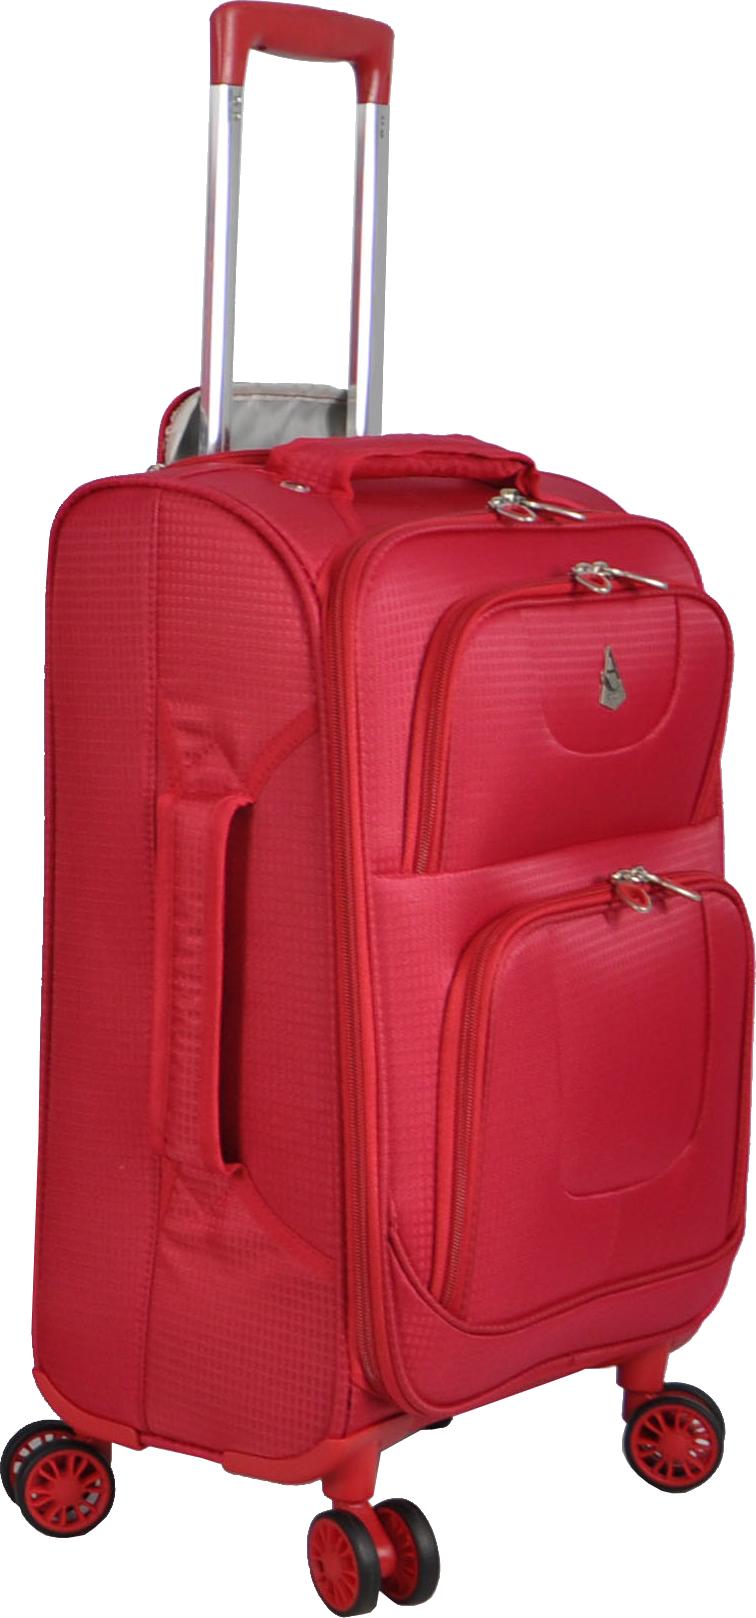 Pink luggage PNG image